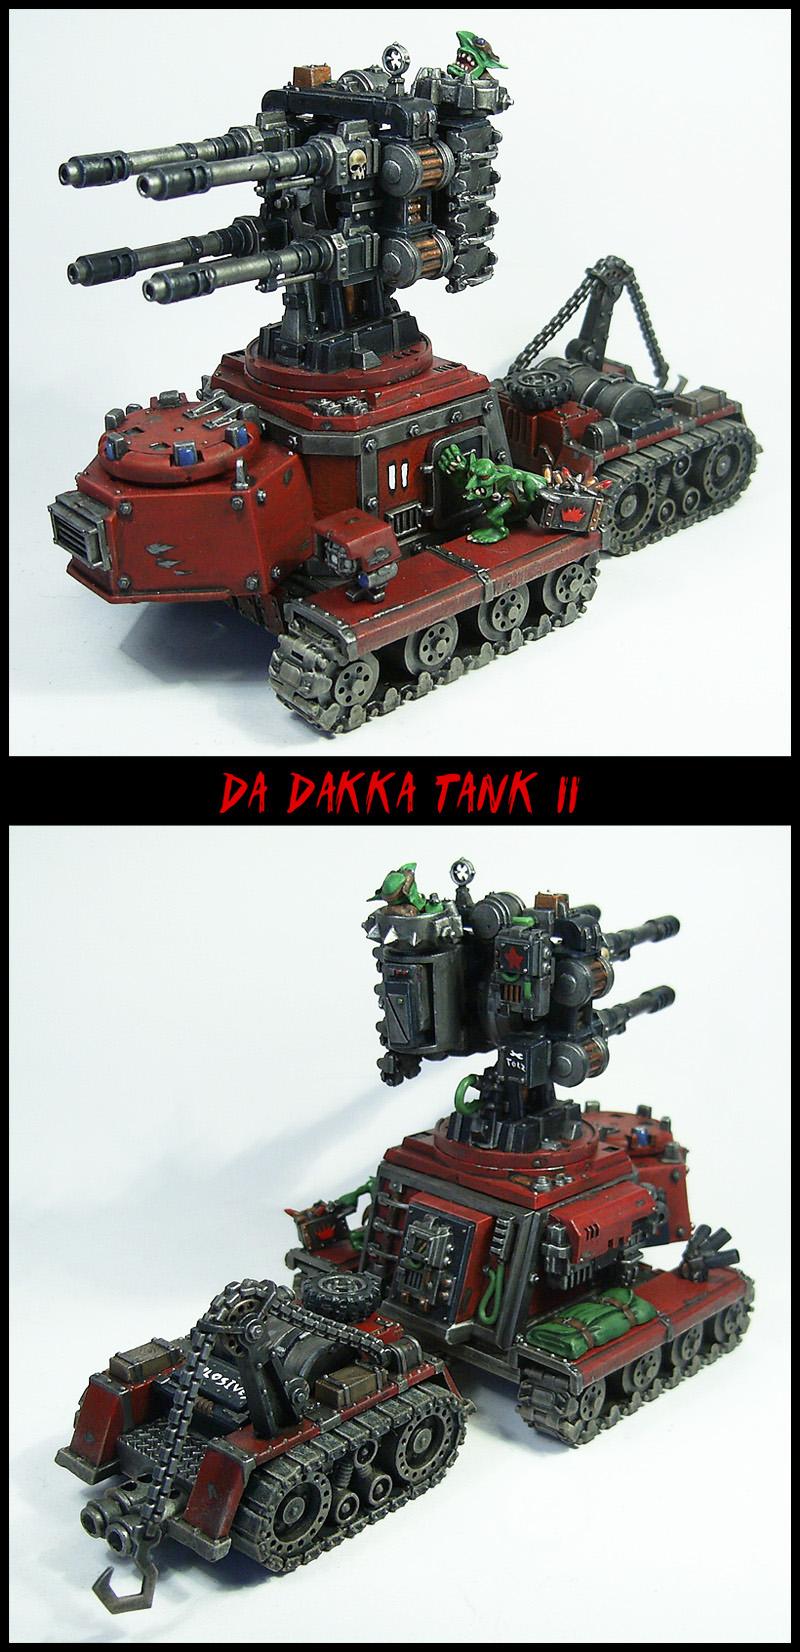 Grot Dakka Tank II by Proiteus